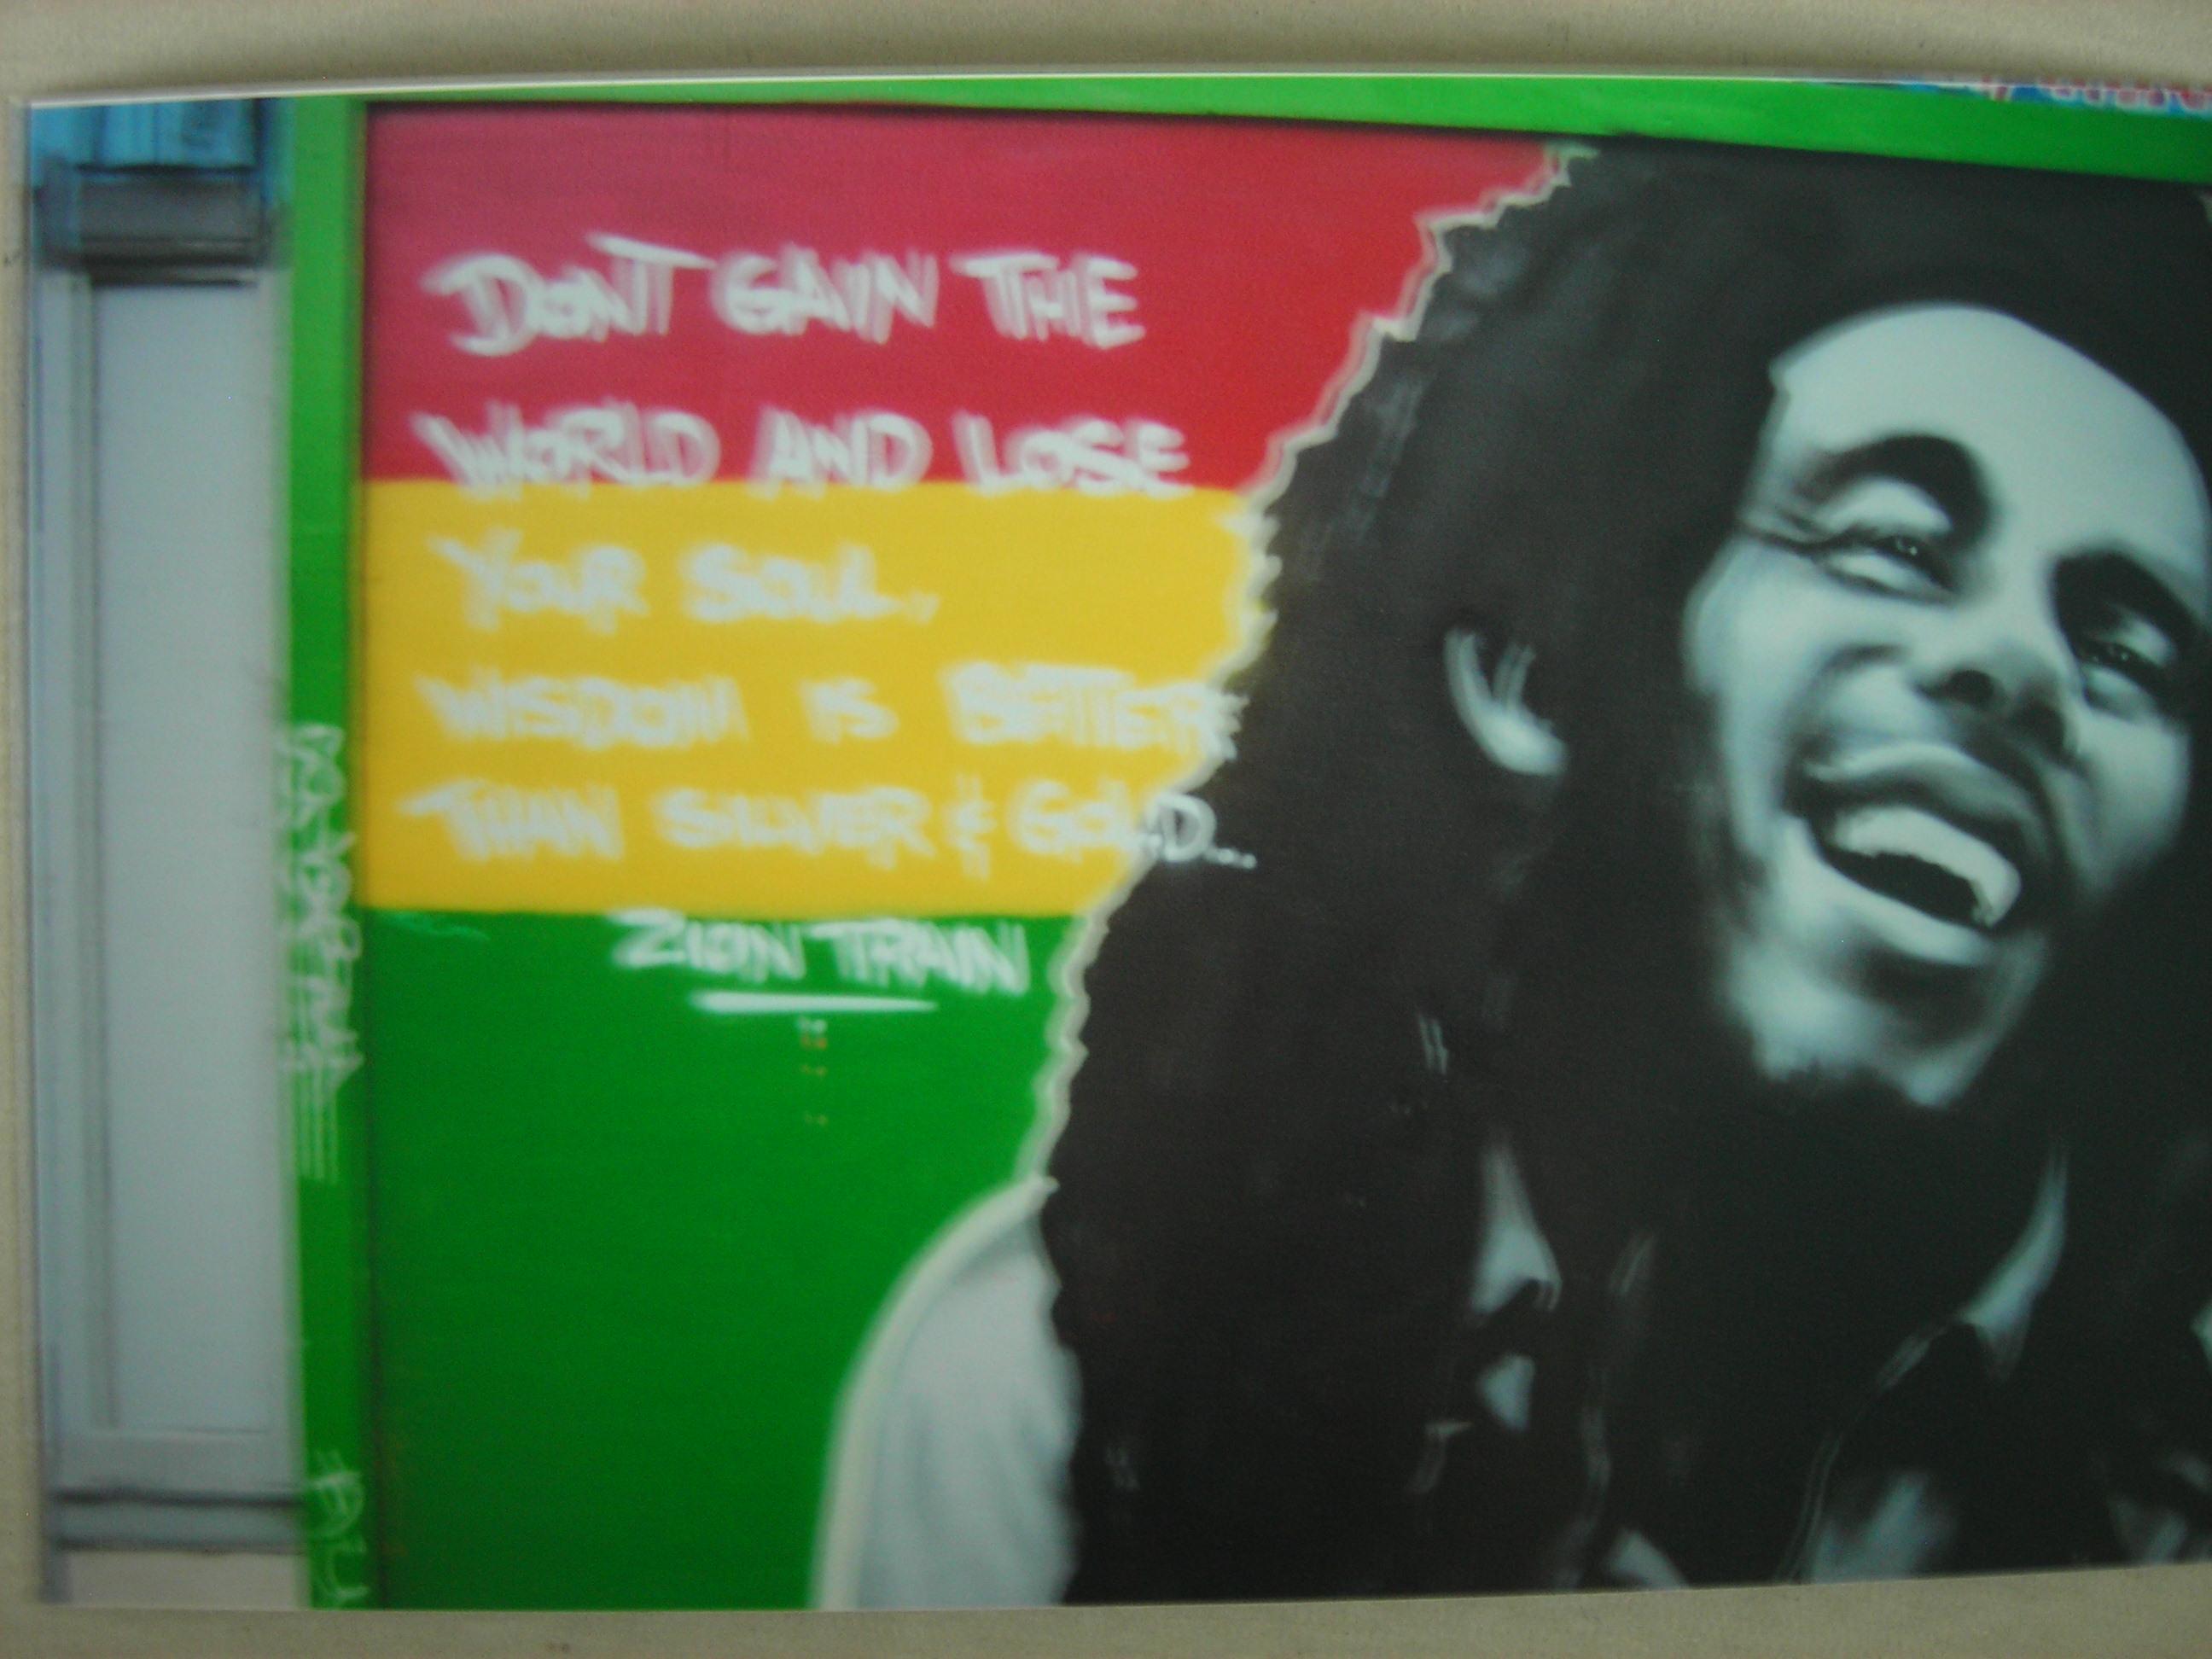 Bob Marley Mural in San Fran.